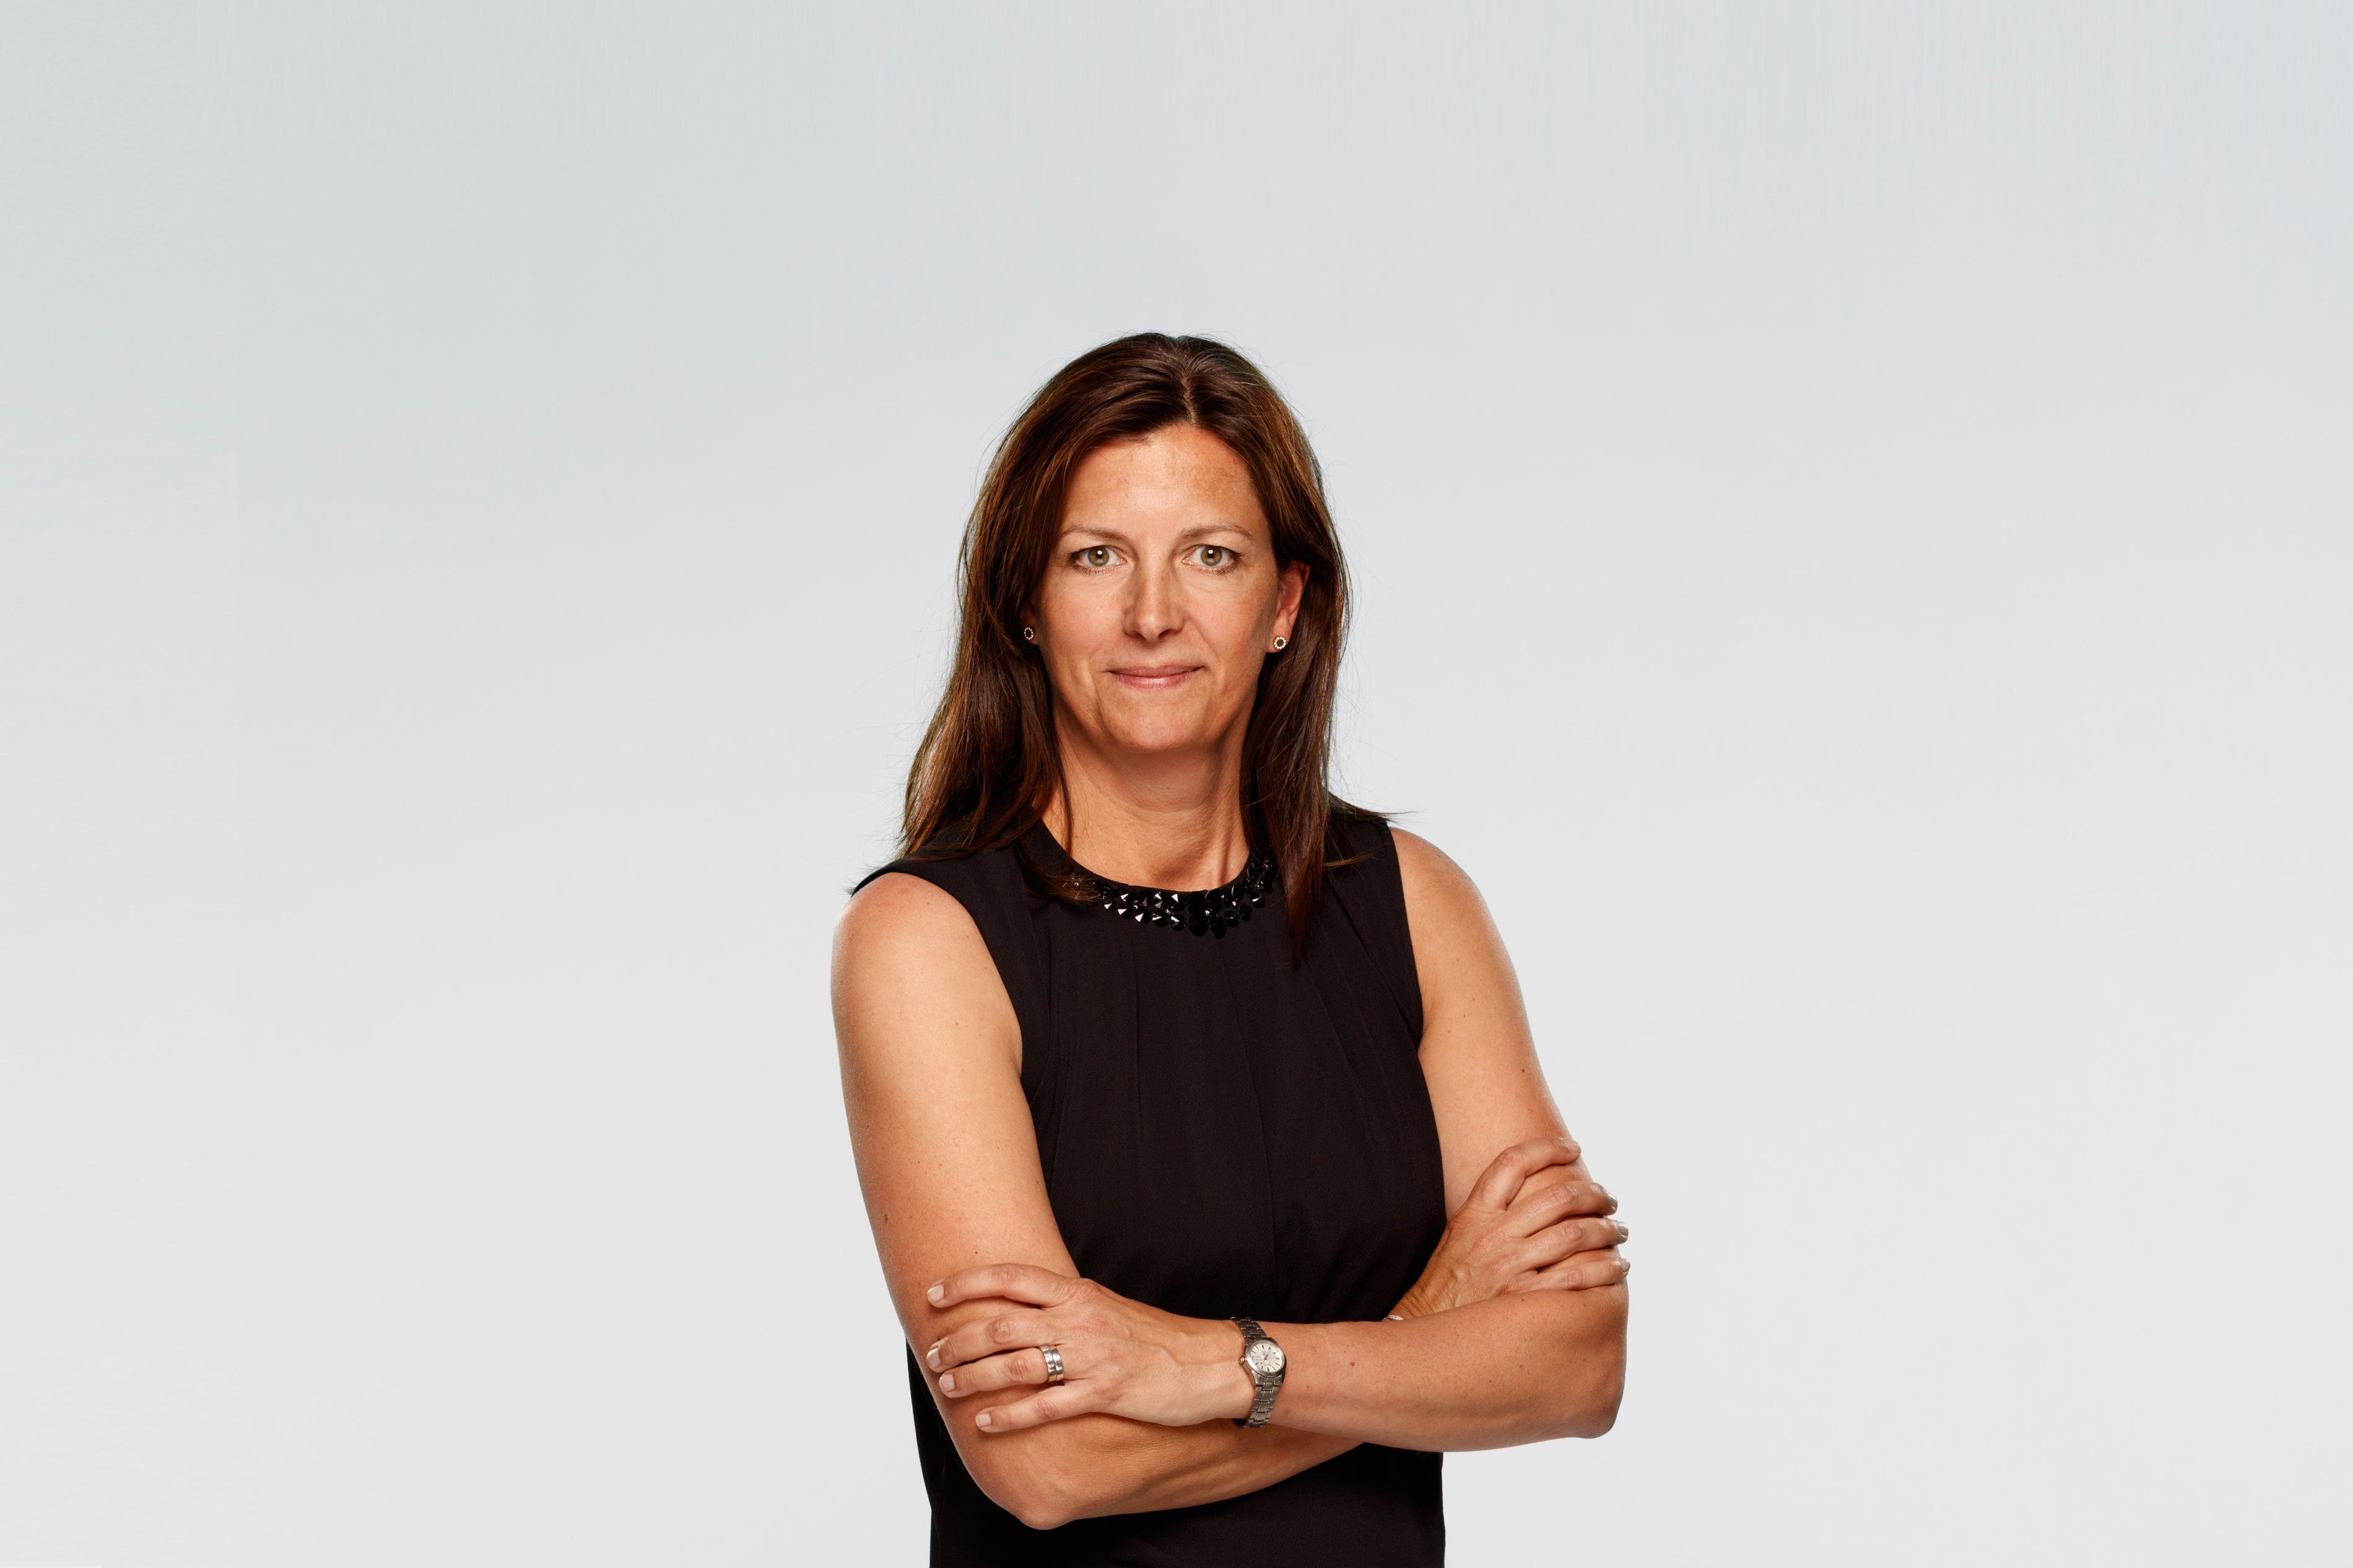 Anneli Dahl